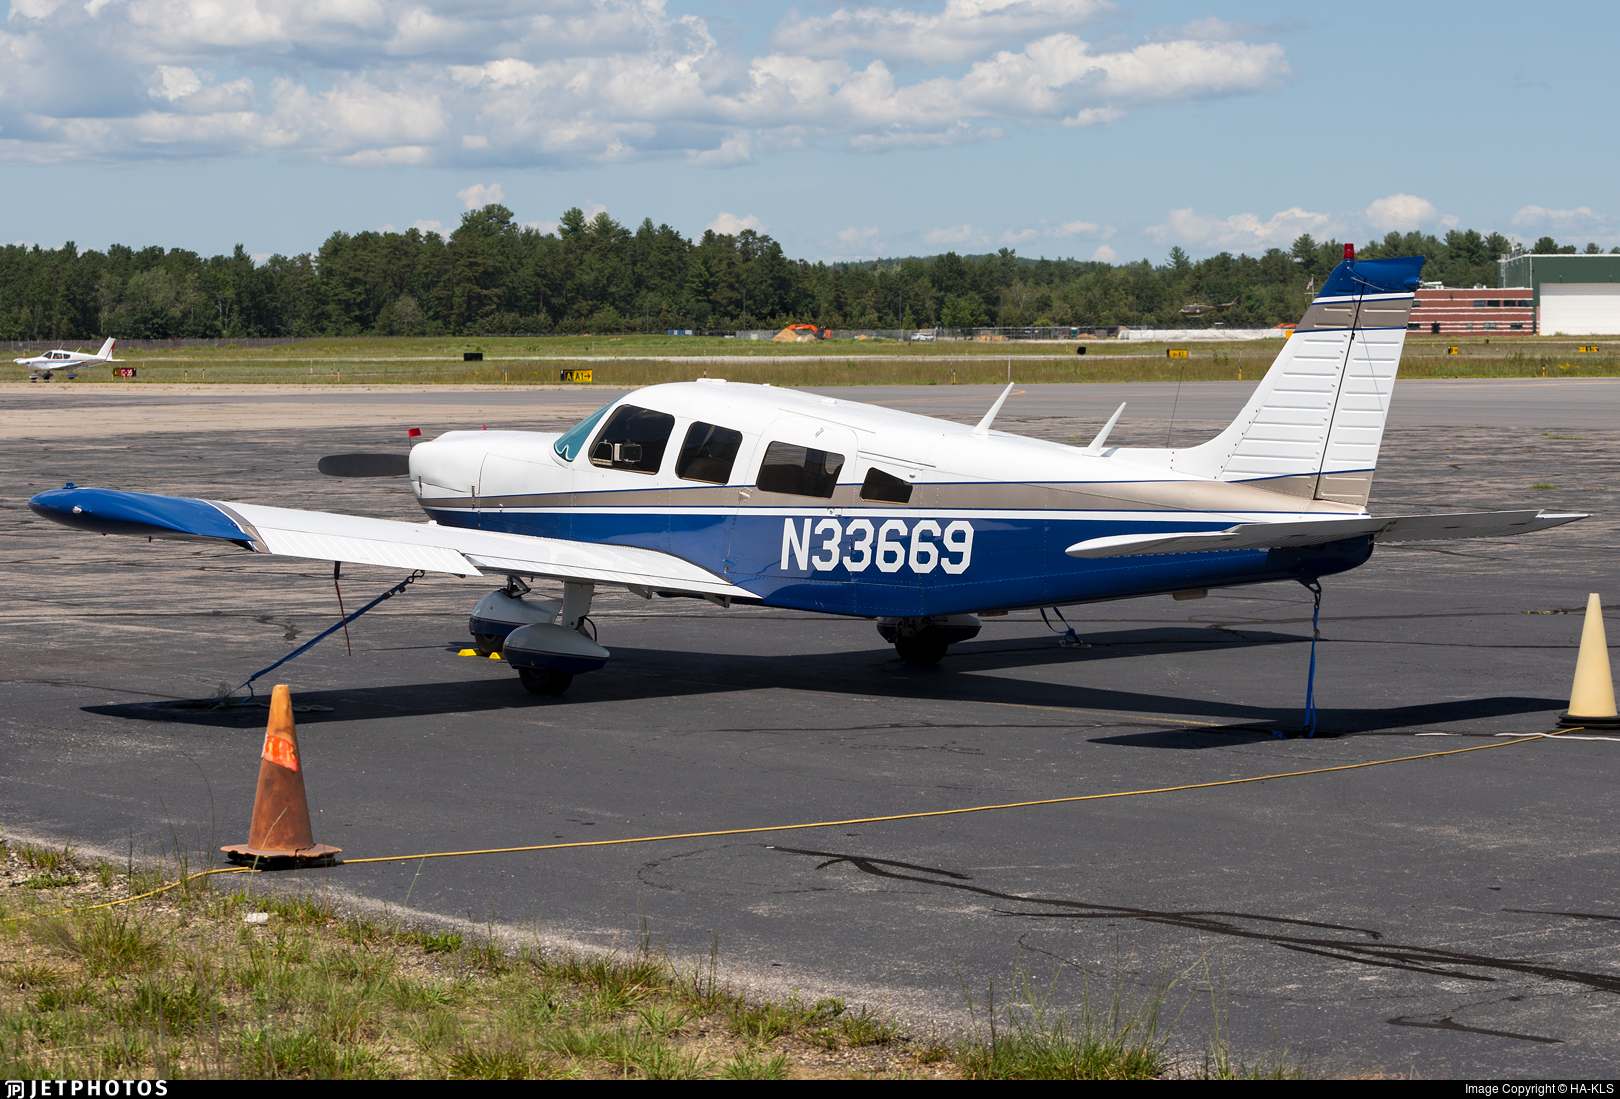 N33669 - Piper PA-32-300 Cherokee Six - Private